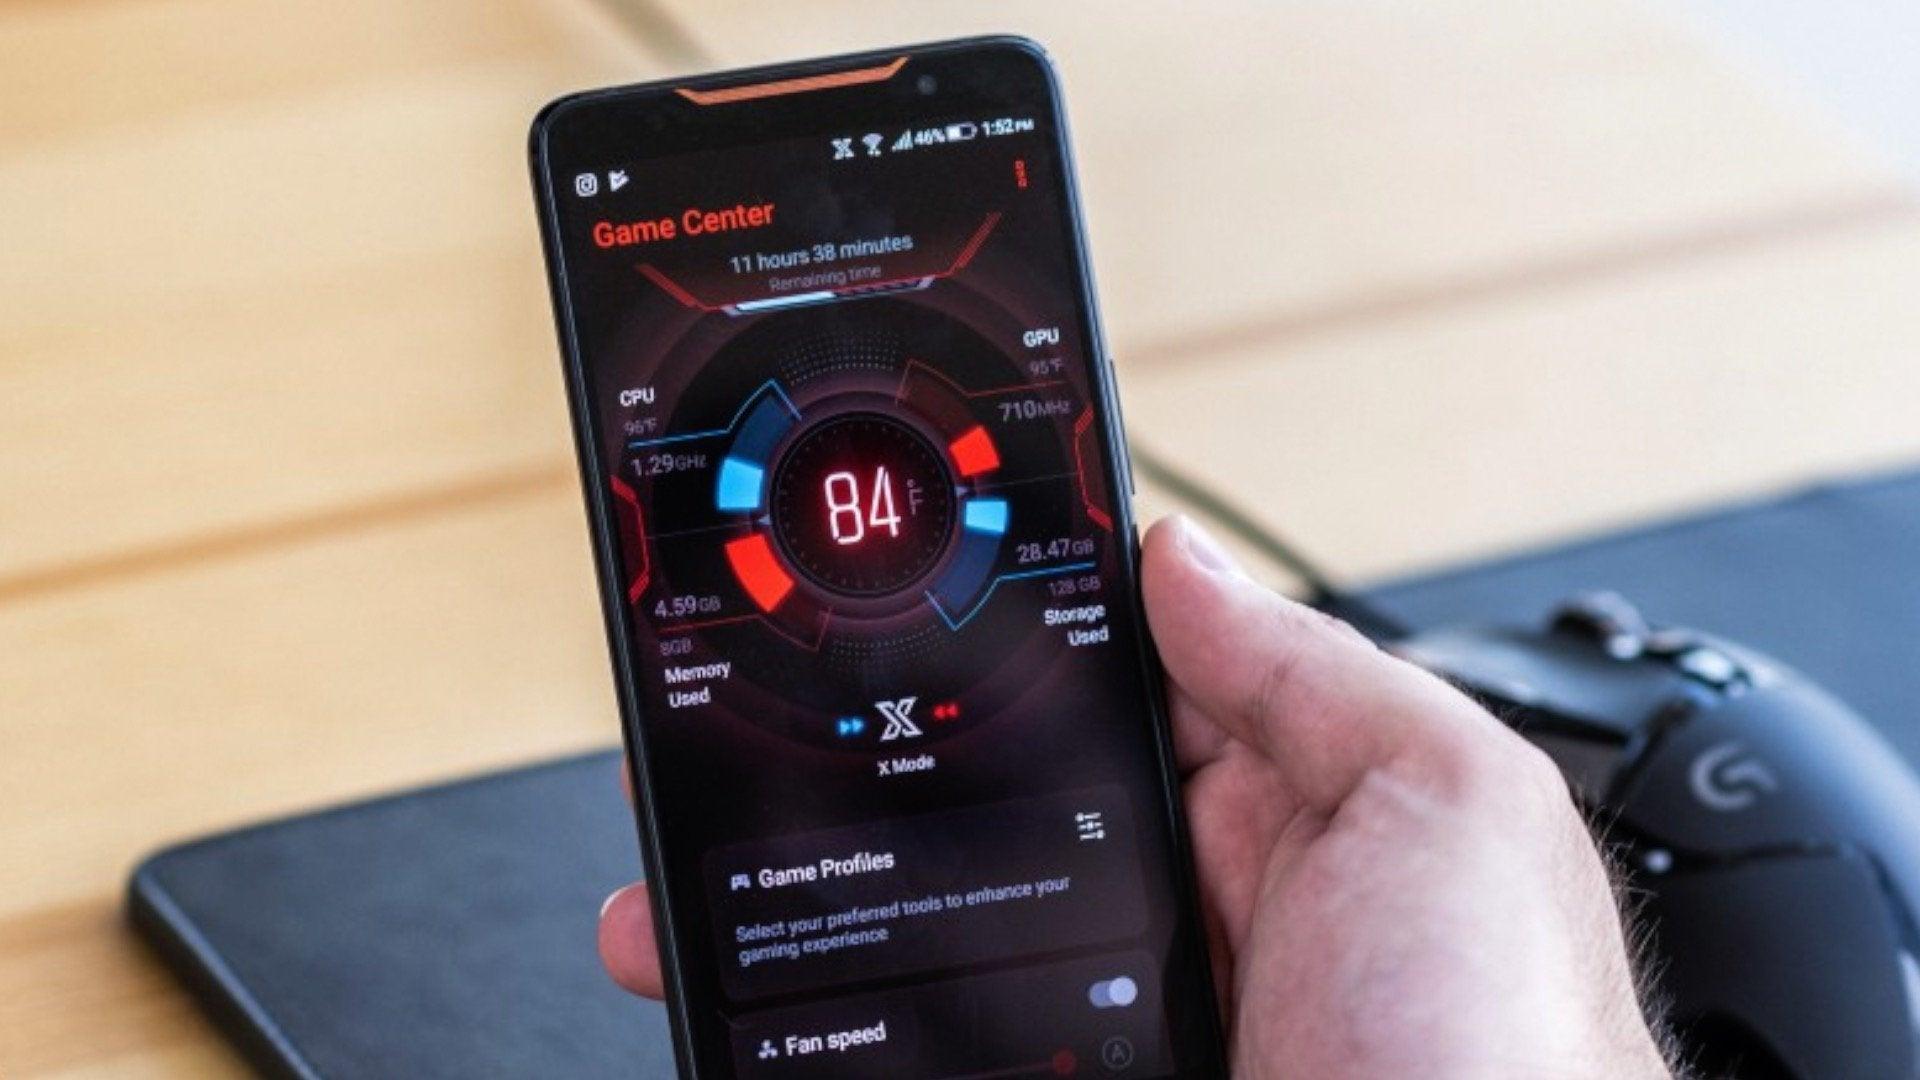 Black Friday Asus Best Deals - ASUS ROG ZS600KL Gaming Phone